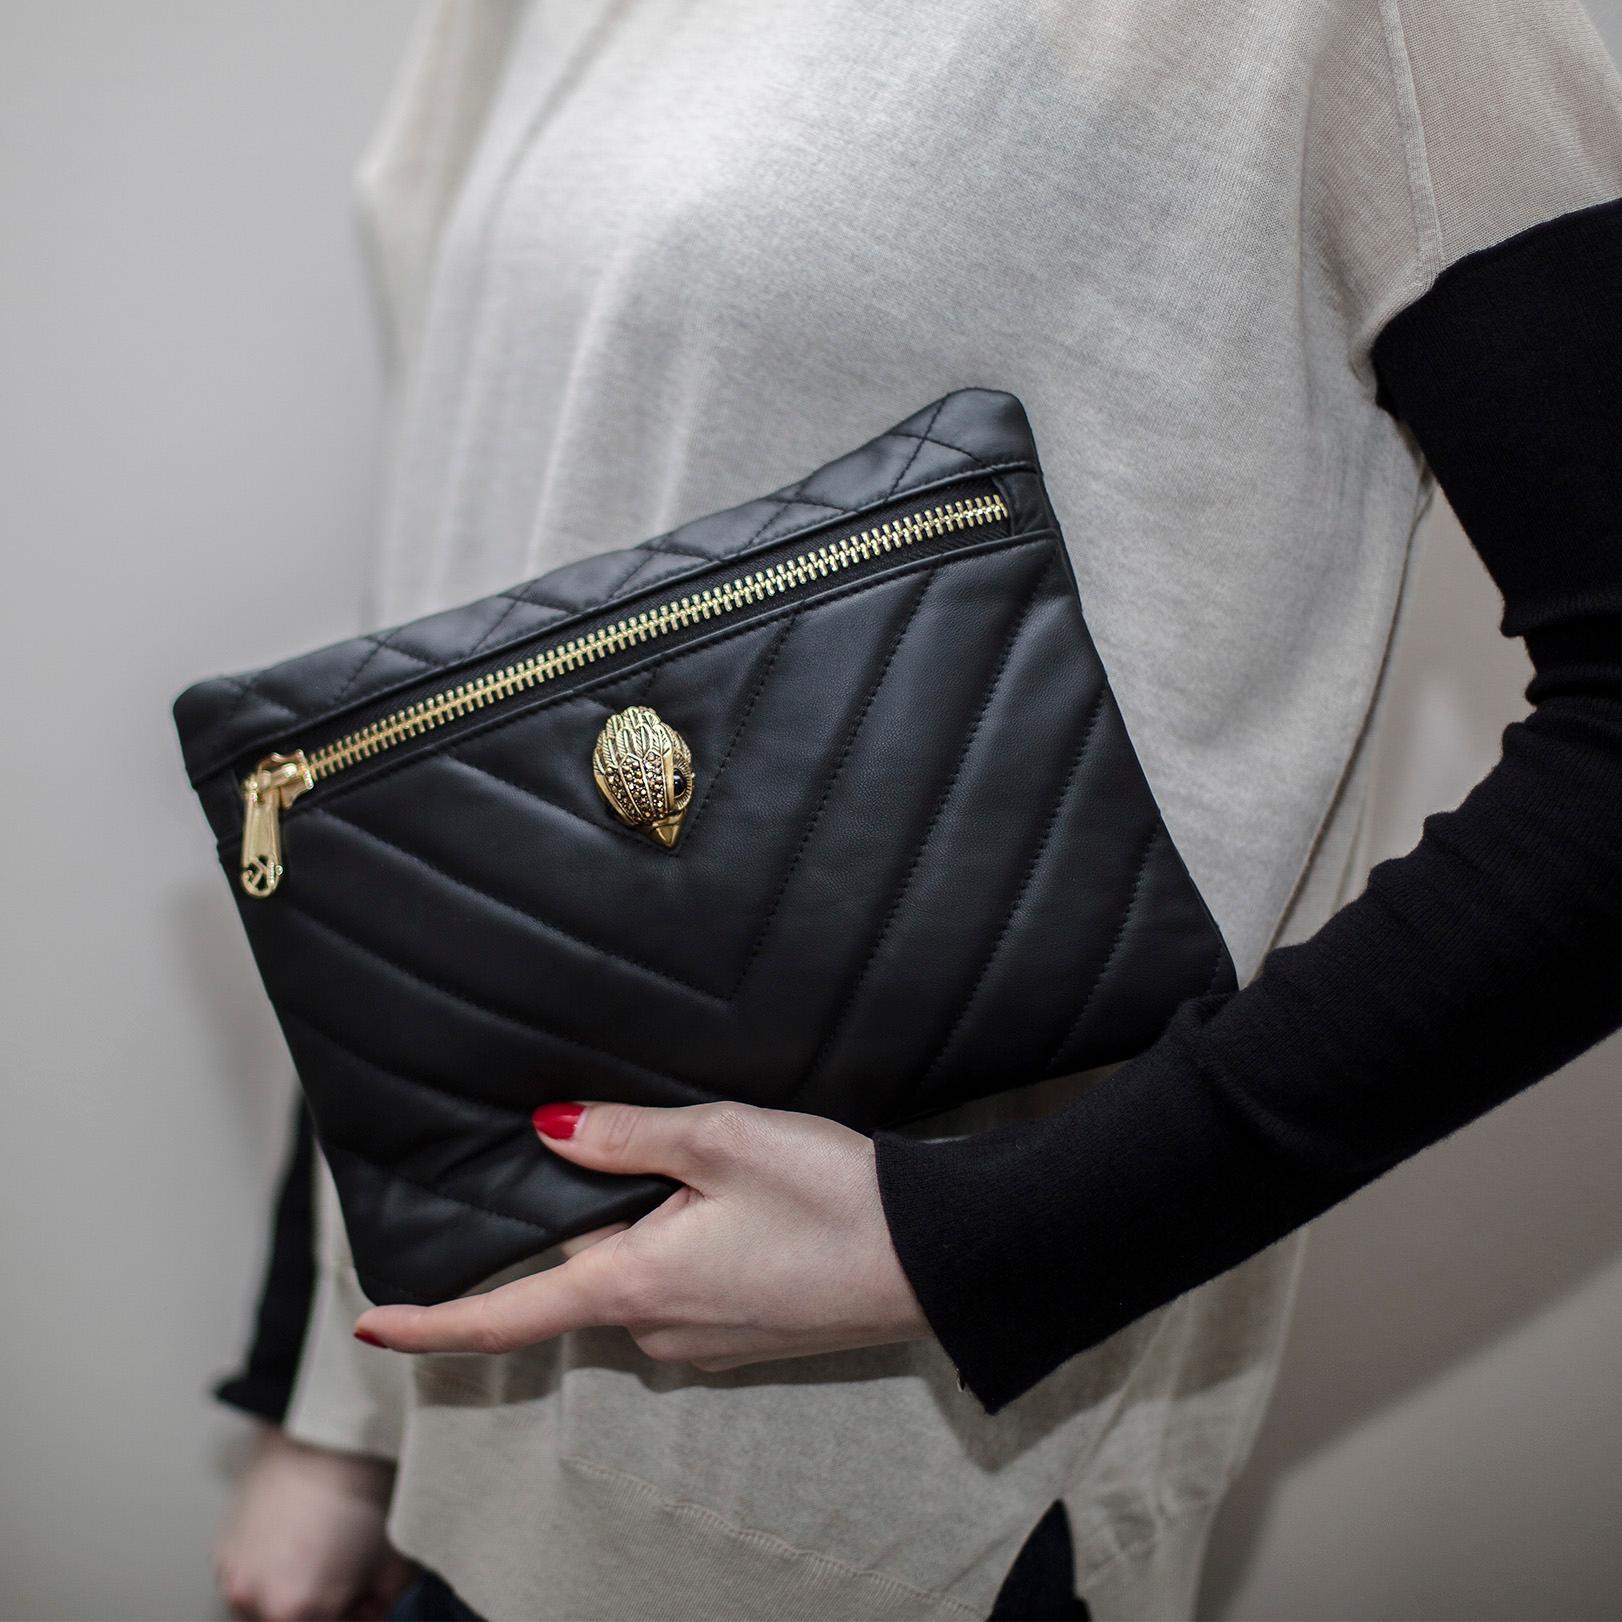 Leather Kensington Pouch Kurt Geiger London Evening Bags